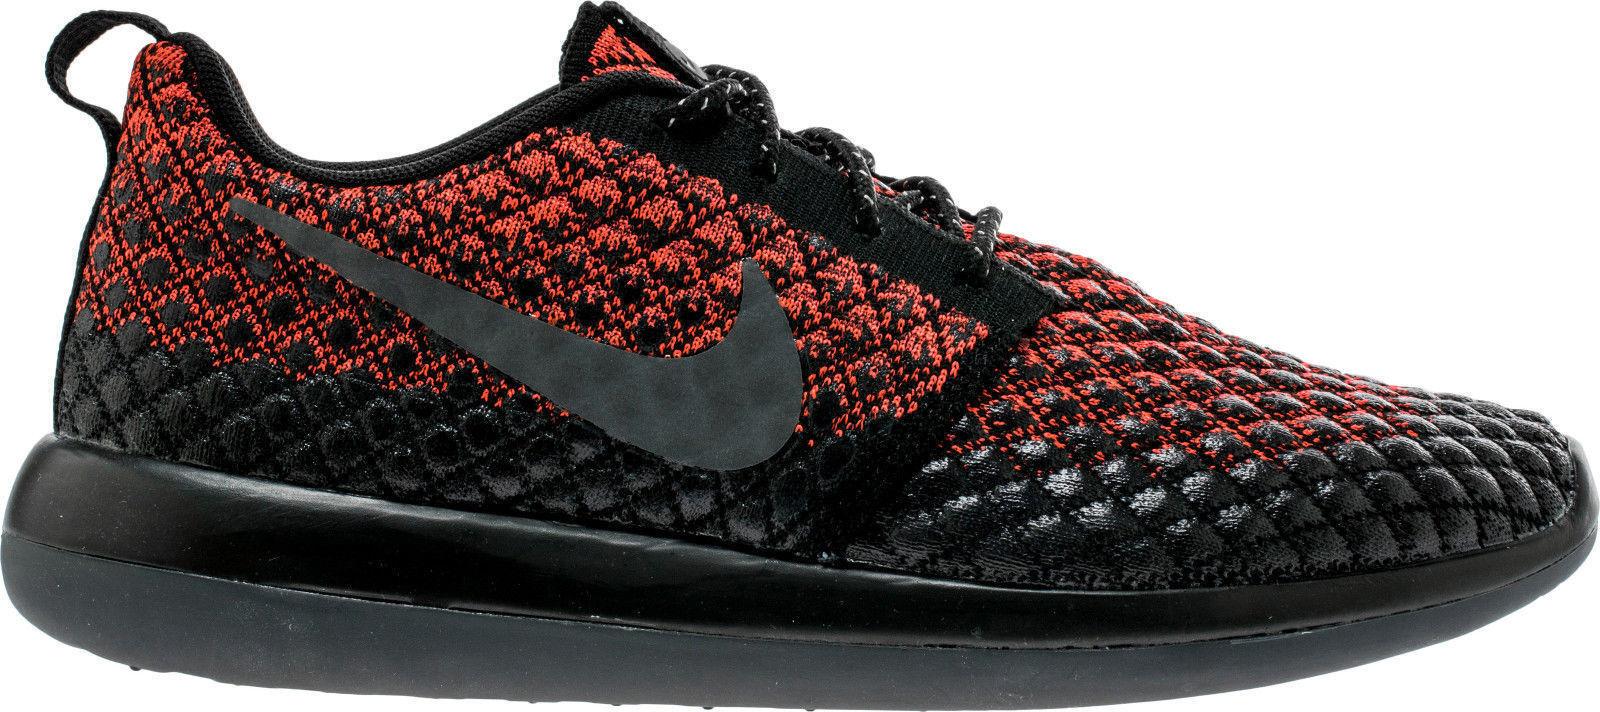 Nike 365 roshe 2 flyknit 365 Nike raggiante grigio scuro nero 859535-600 Uomo sz 11,5 adac33